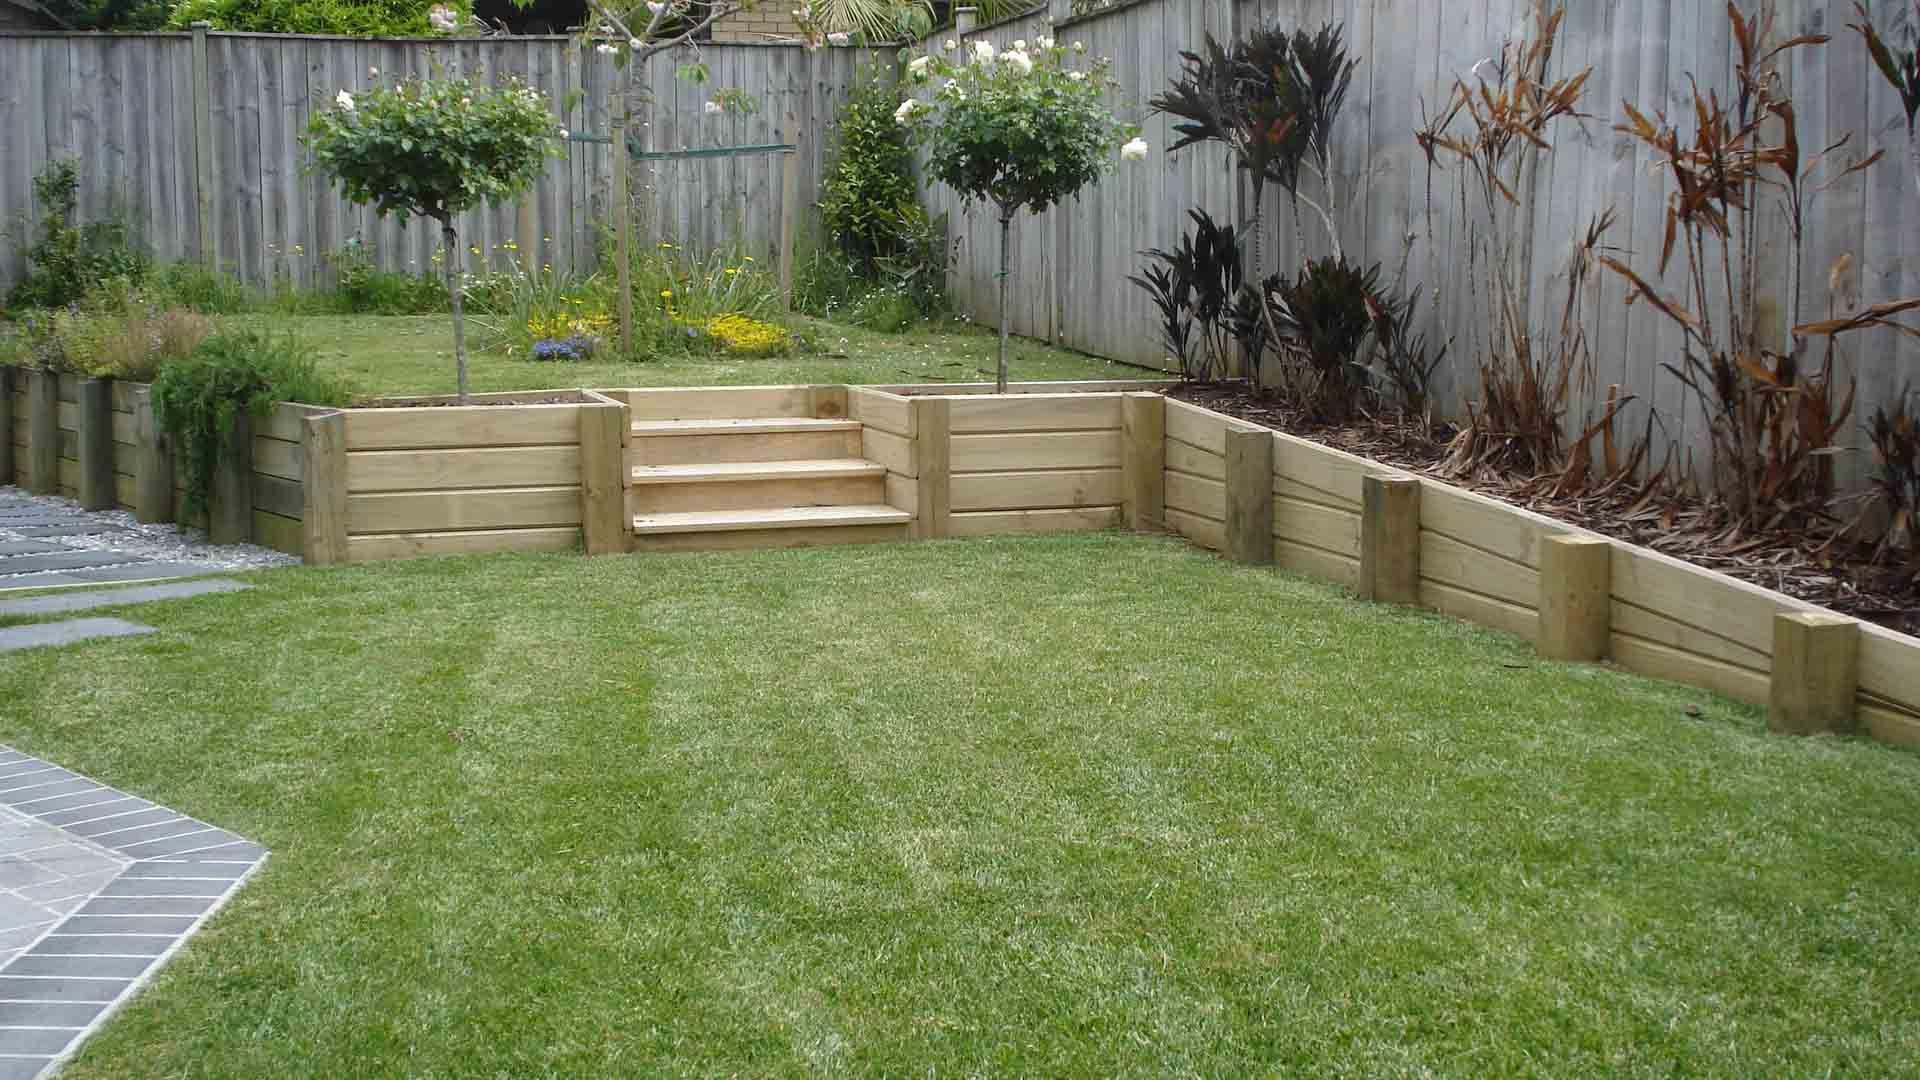 Retaining Walls Junglefix Landscaping Retaining Walls Wood Retaining Wall Garden Retaining Wall